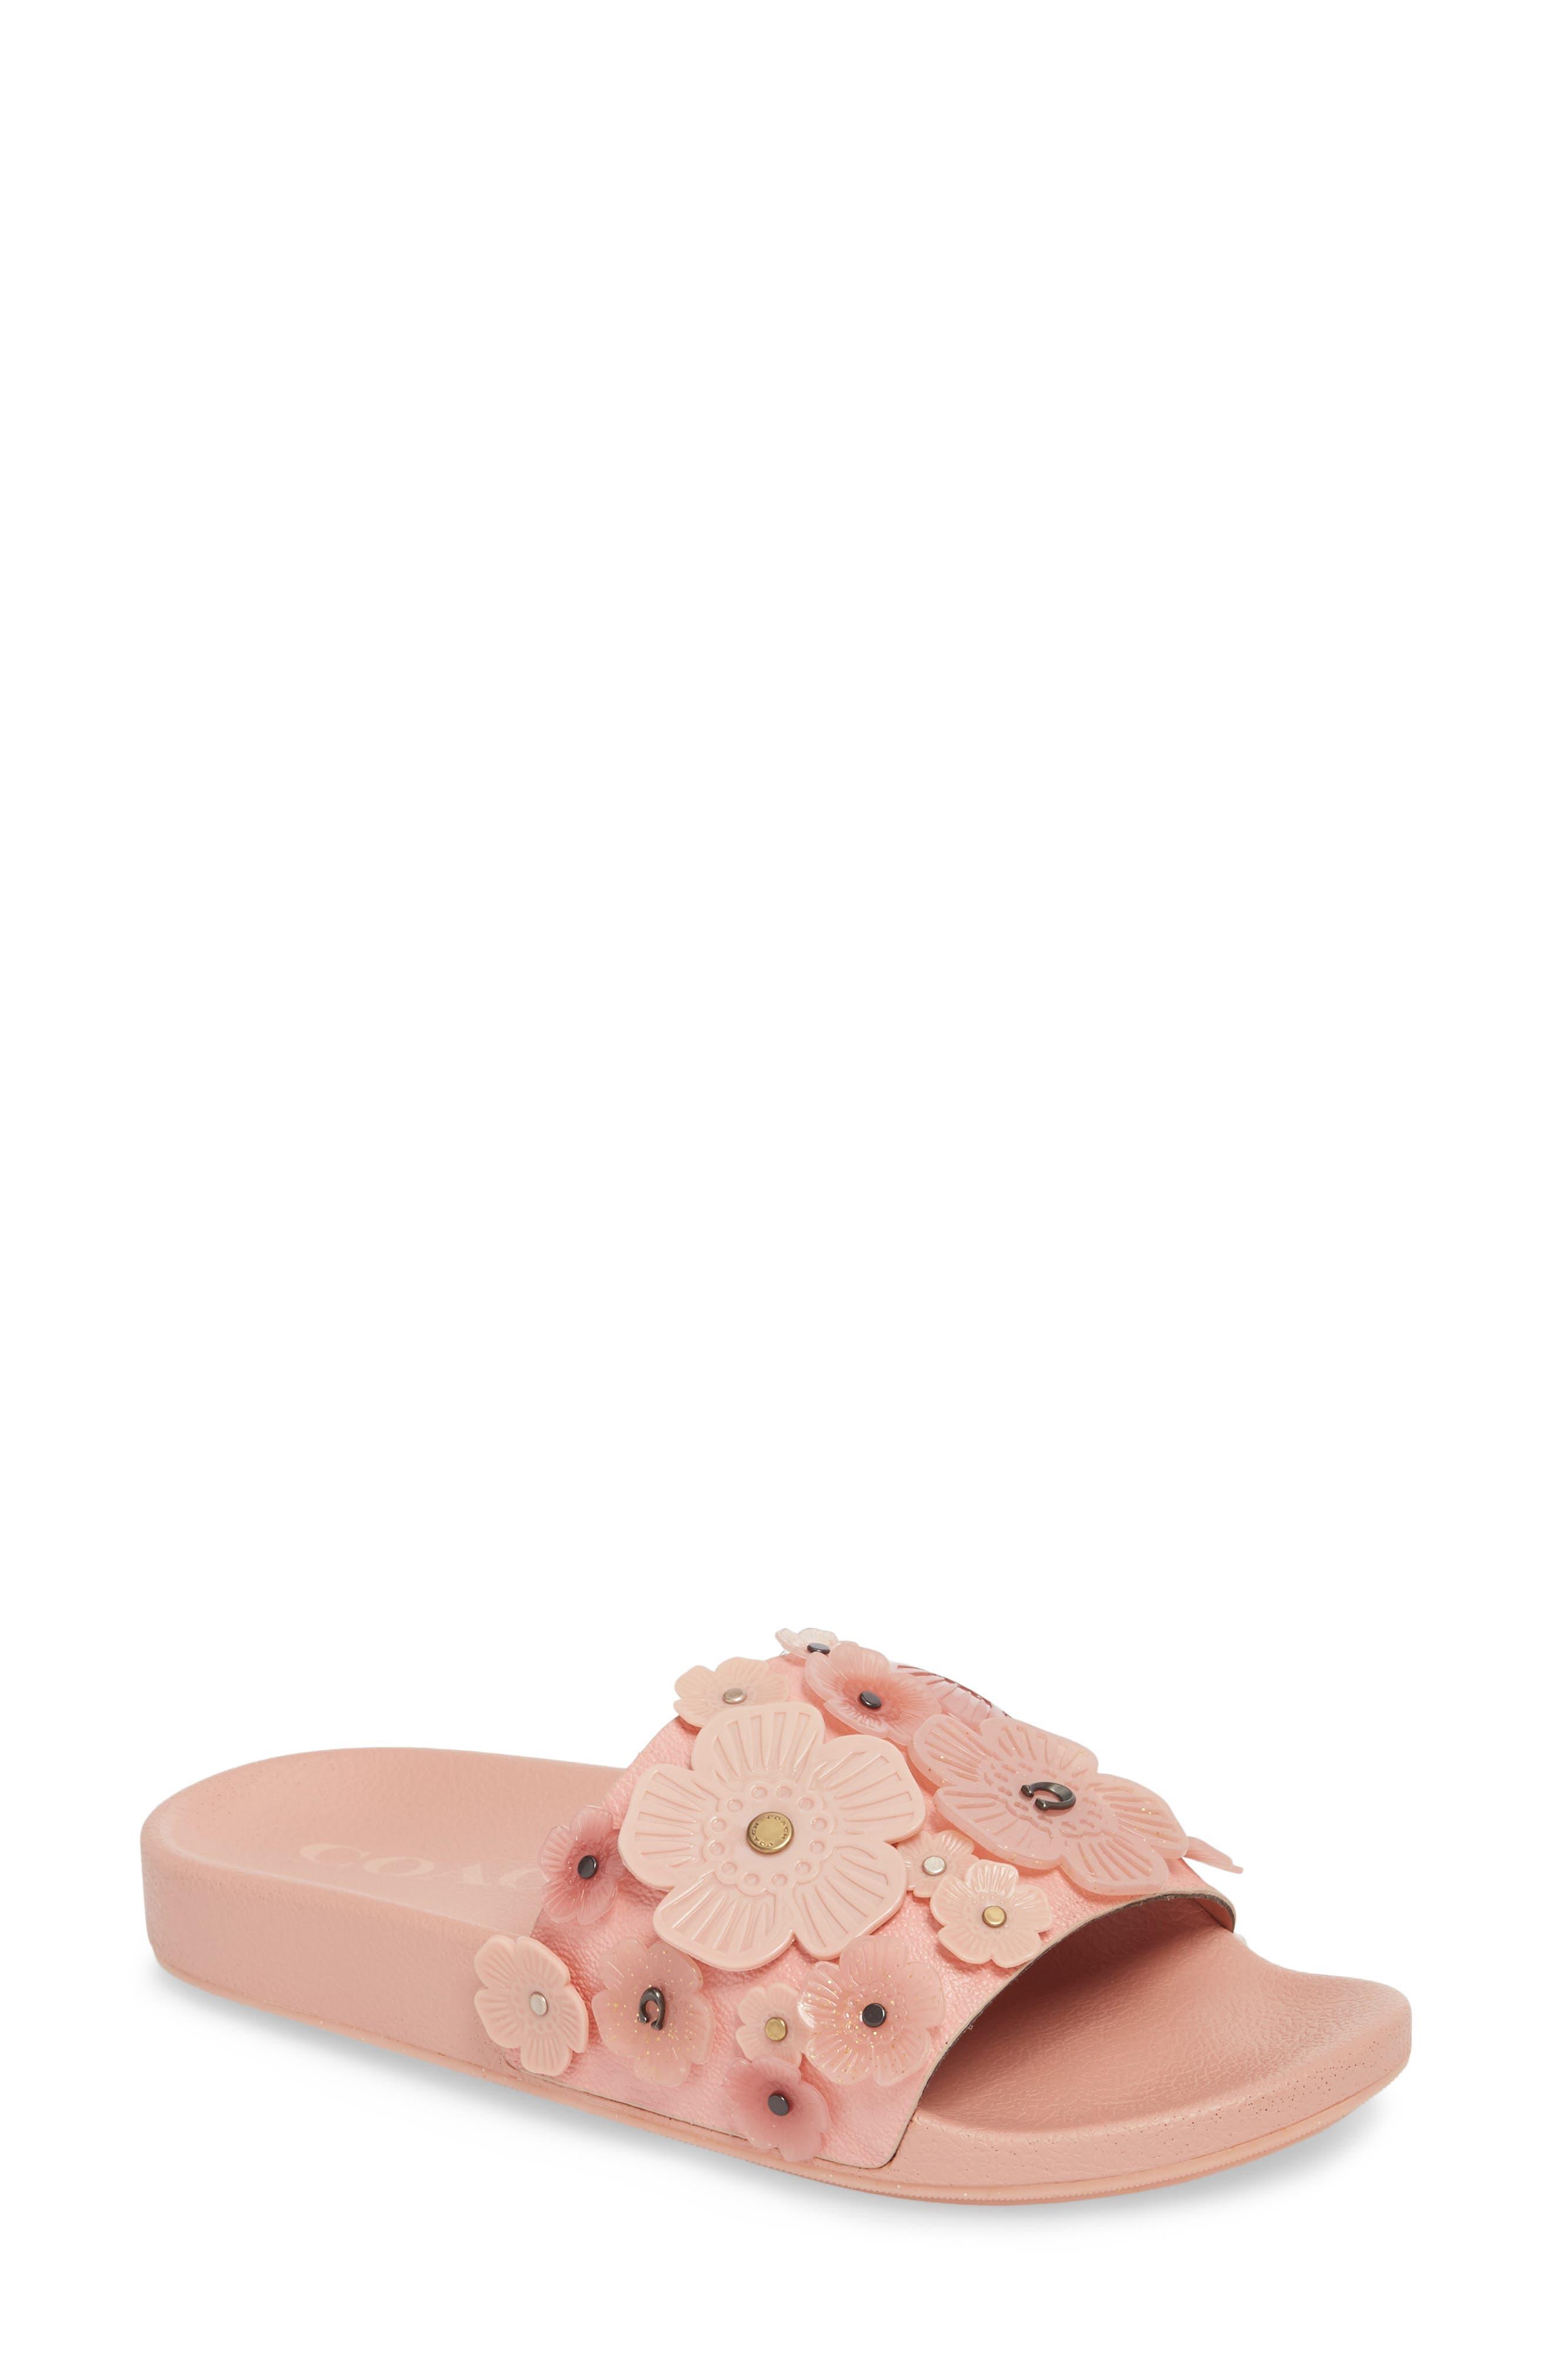 Sophi Slide Sandal,                             Main thumbnail 3, color,